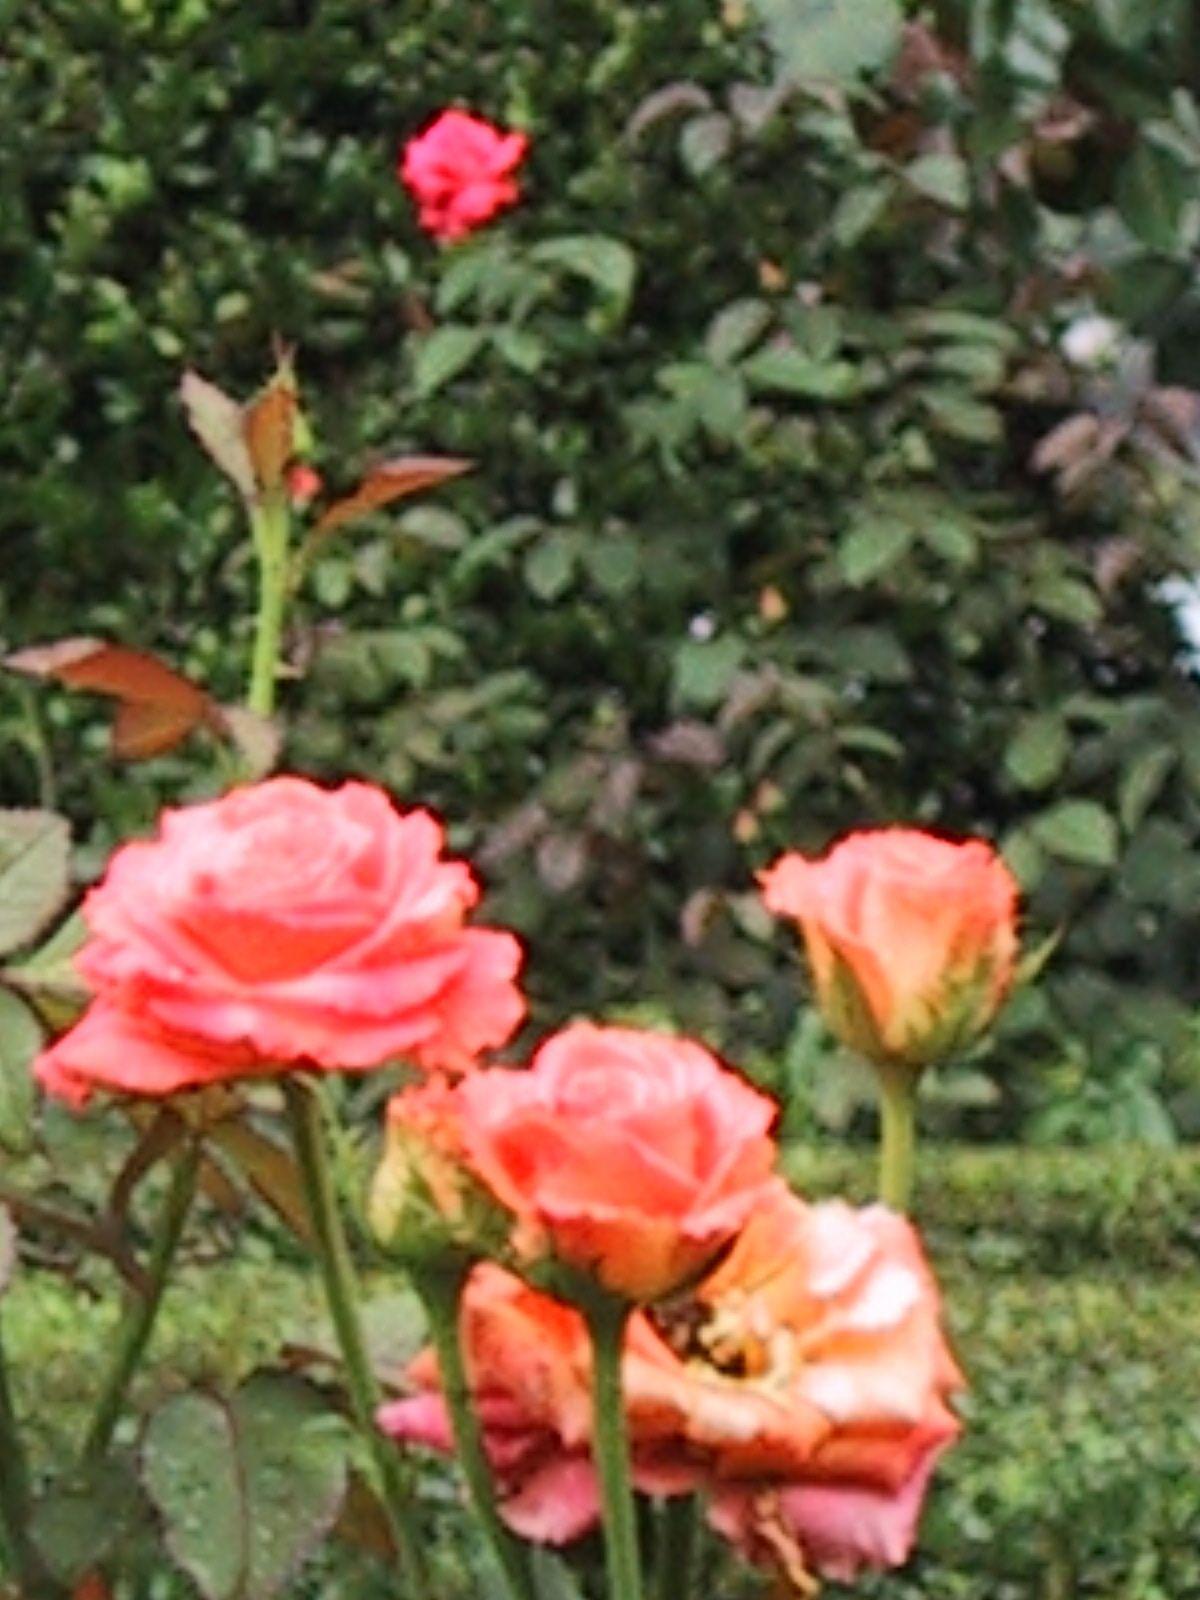 Roses in Furman Rose Garden, Greenville, SC